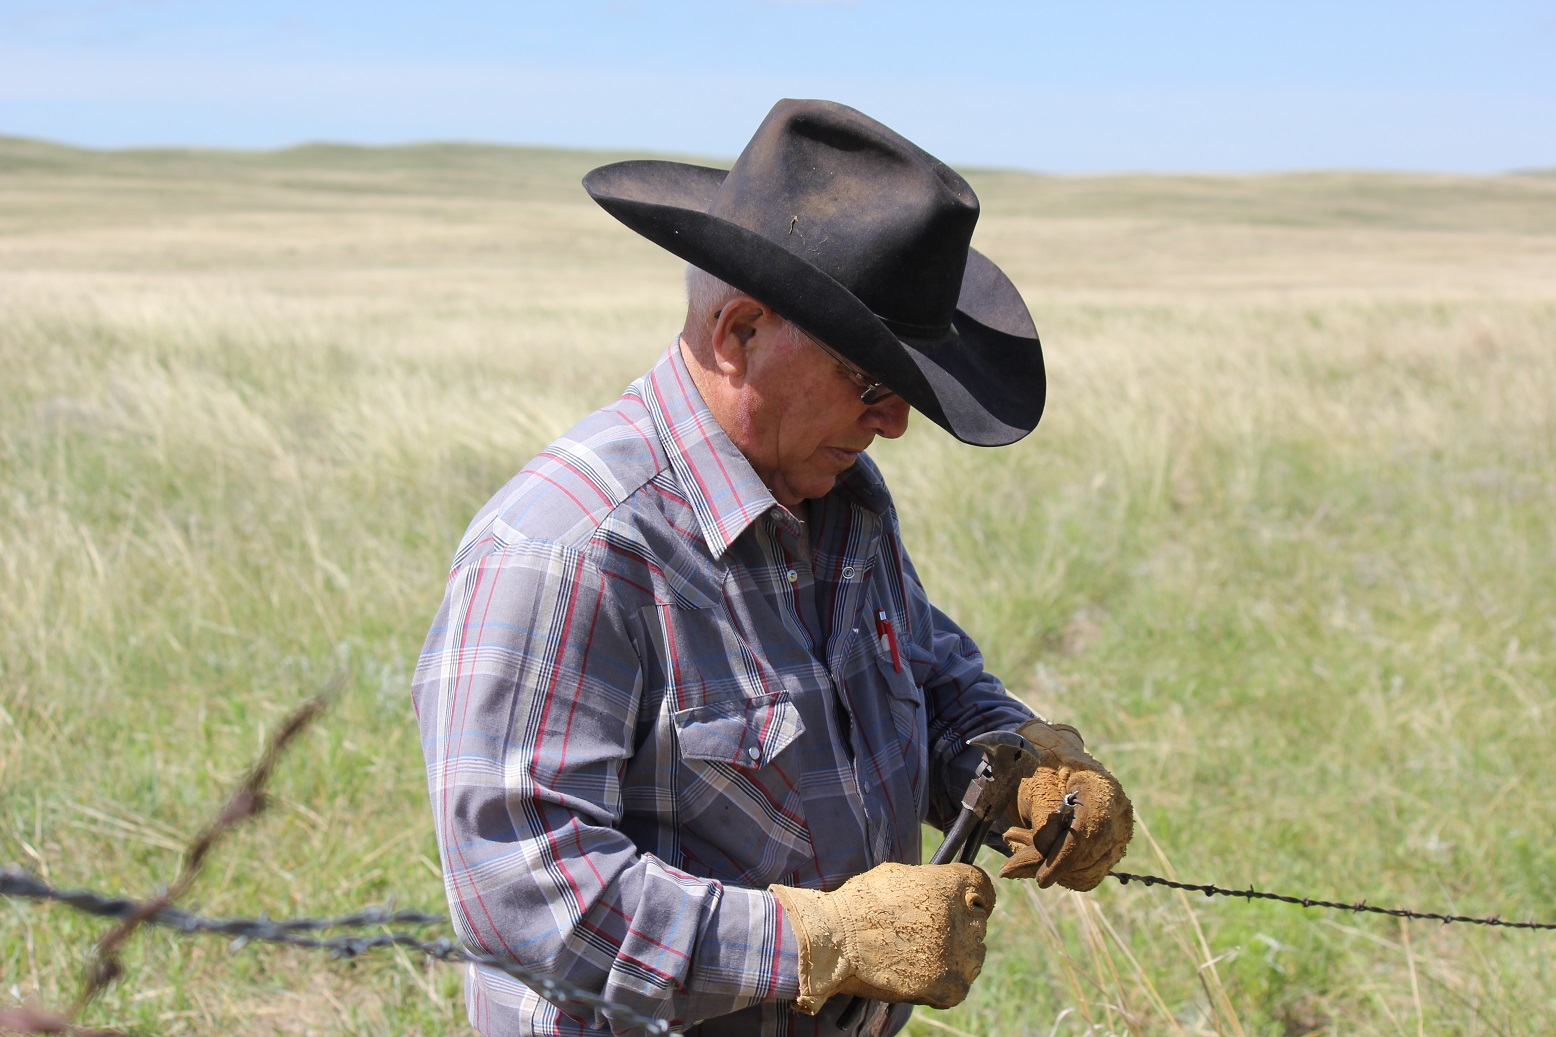 farmer repairing fence